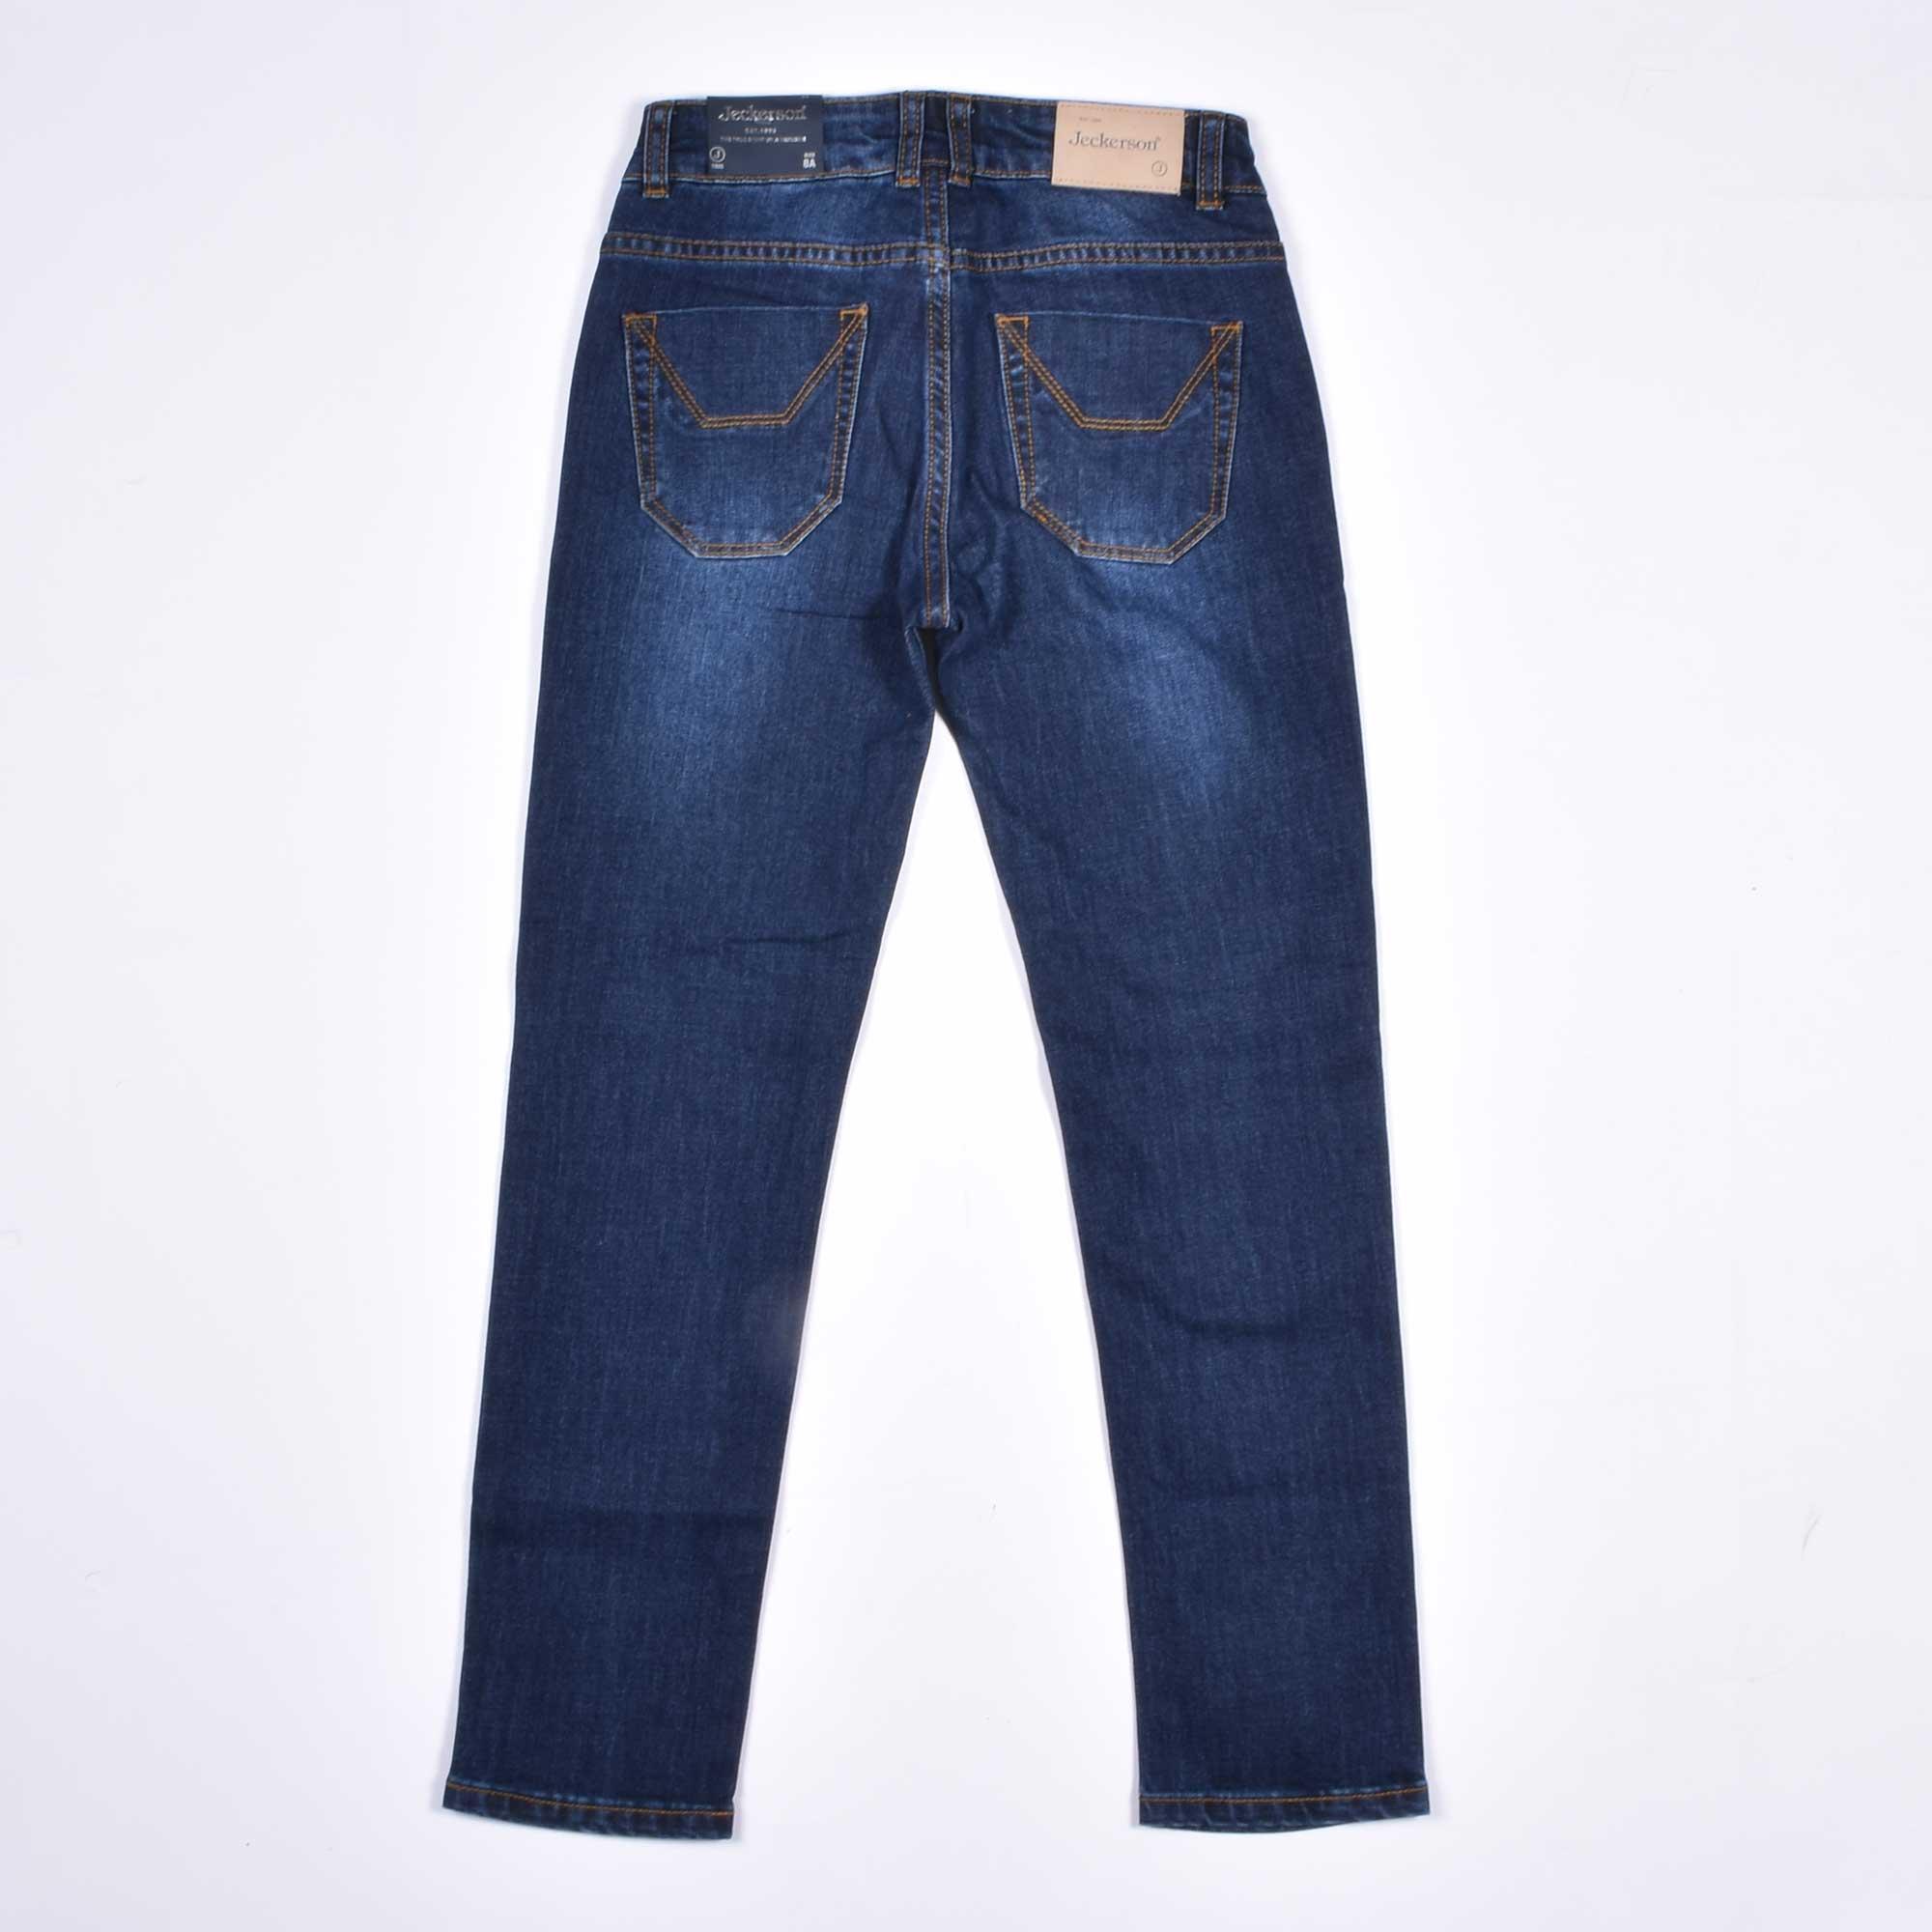 Jeans toppa denim - Denim scuro